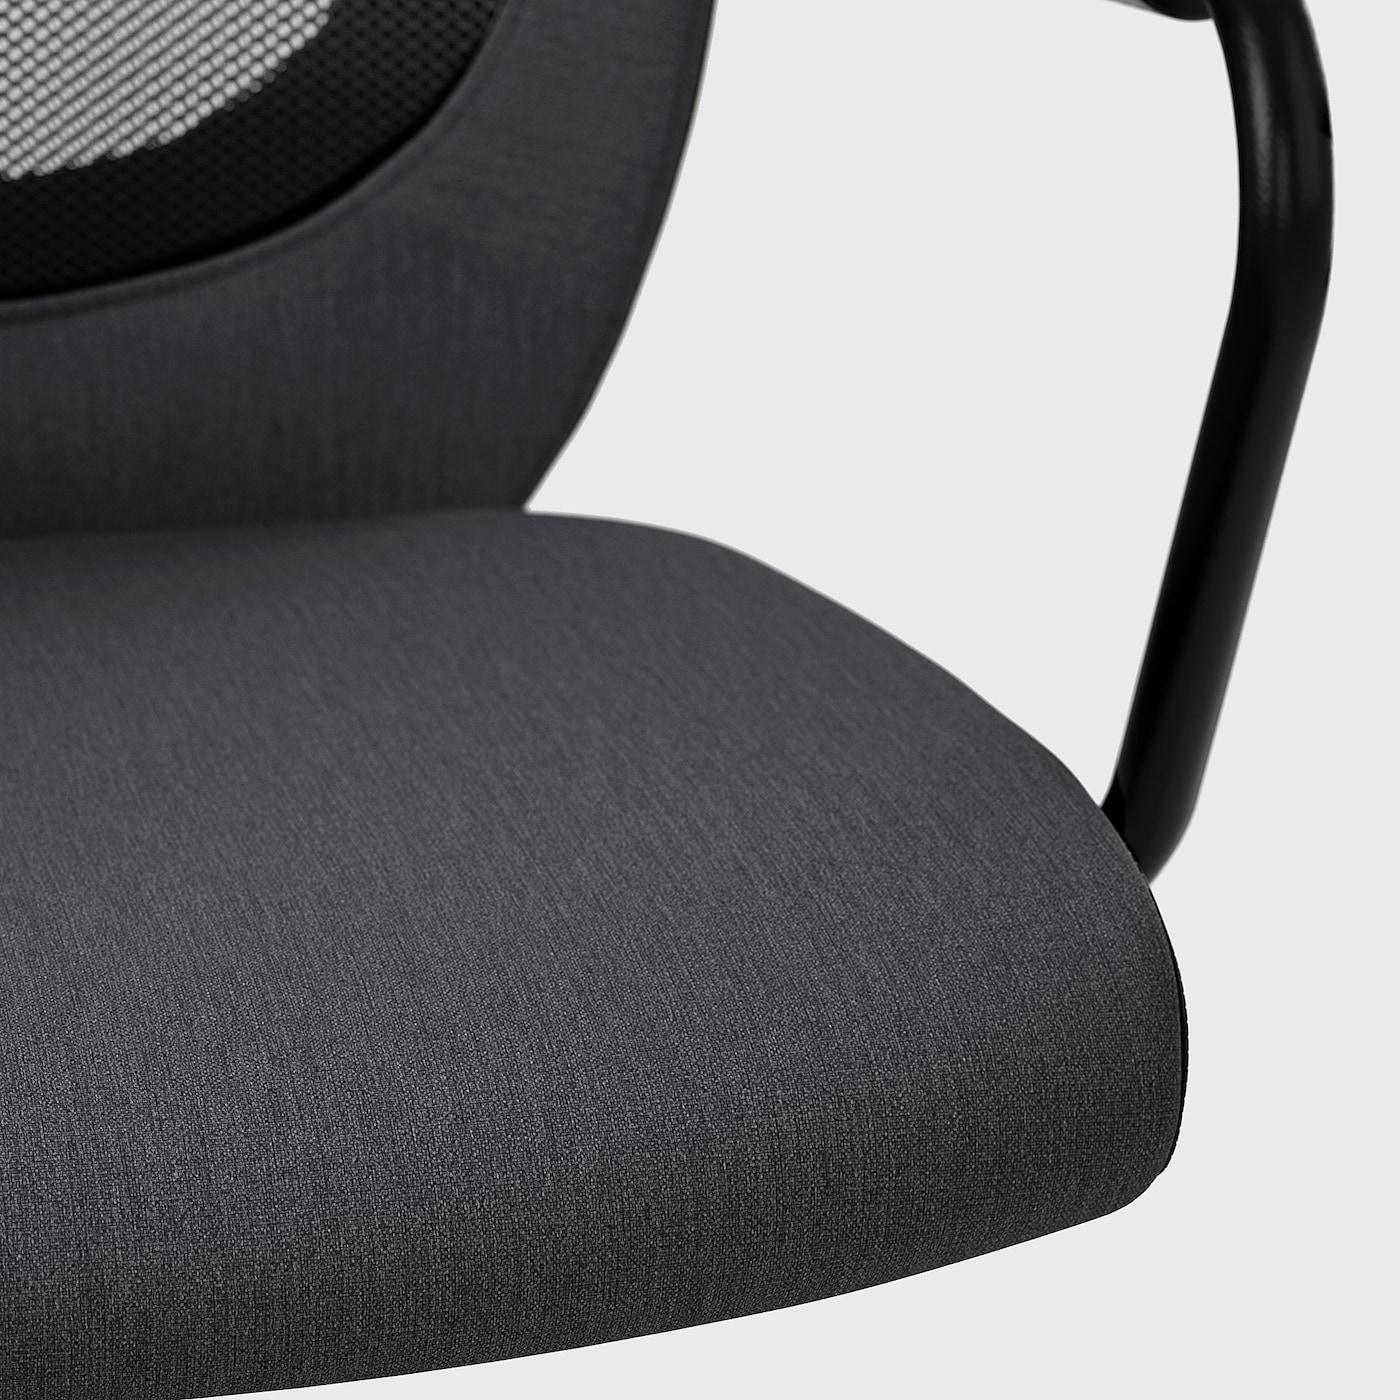 FLINTAN NOMINELL Chaise de bureau av accoudoirs gris